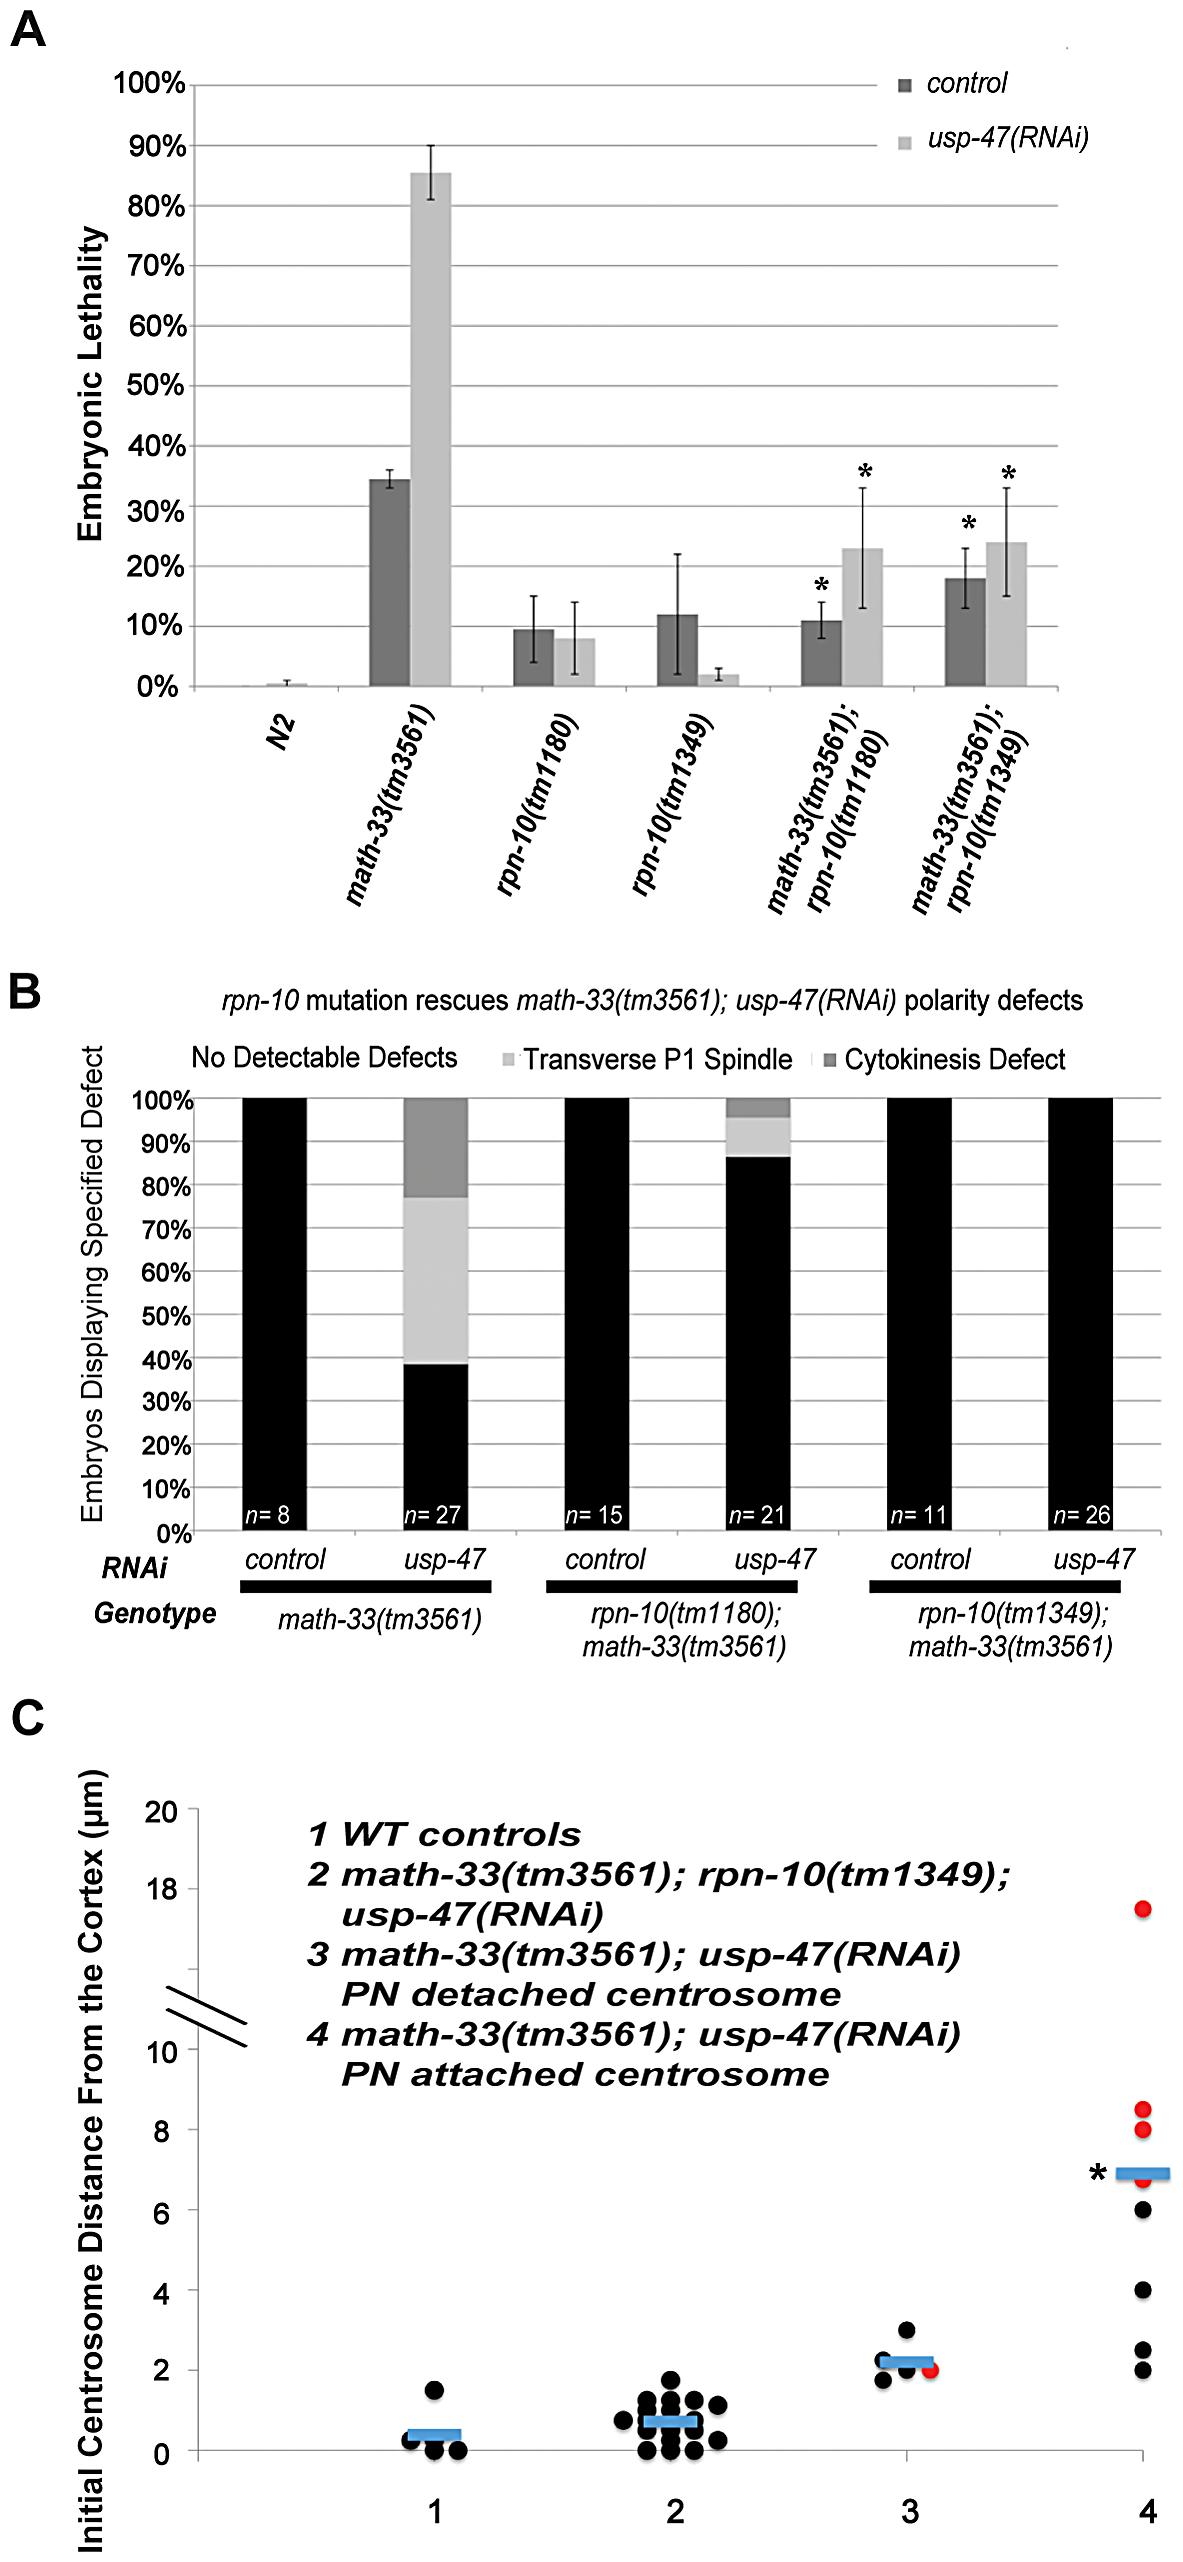 Mutation of <i>rpn-10</i> suppresses lethality and polarity defects in <i>math-33(tm3561); usp-47(RNAi)</i> embryos.